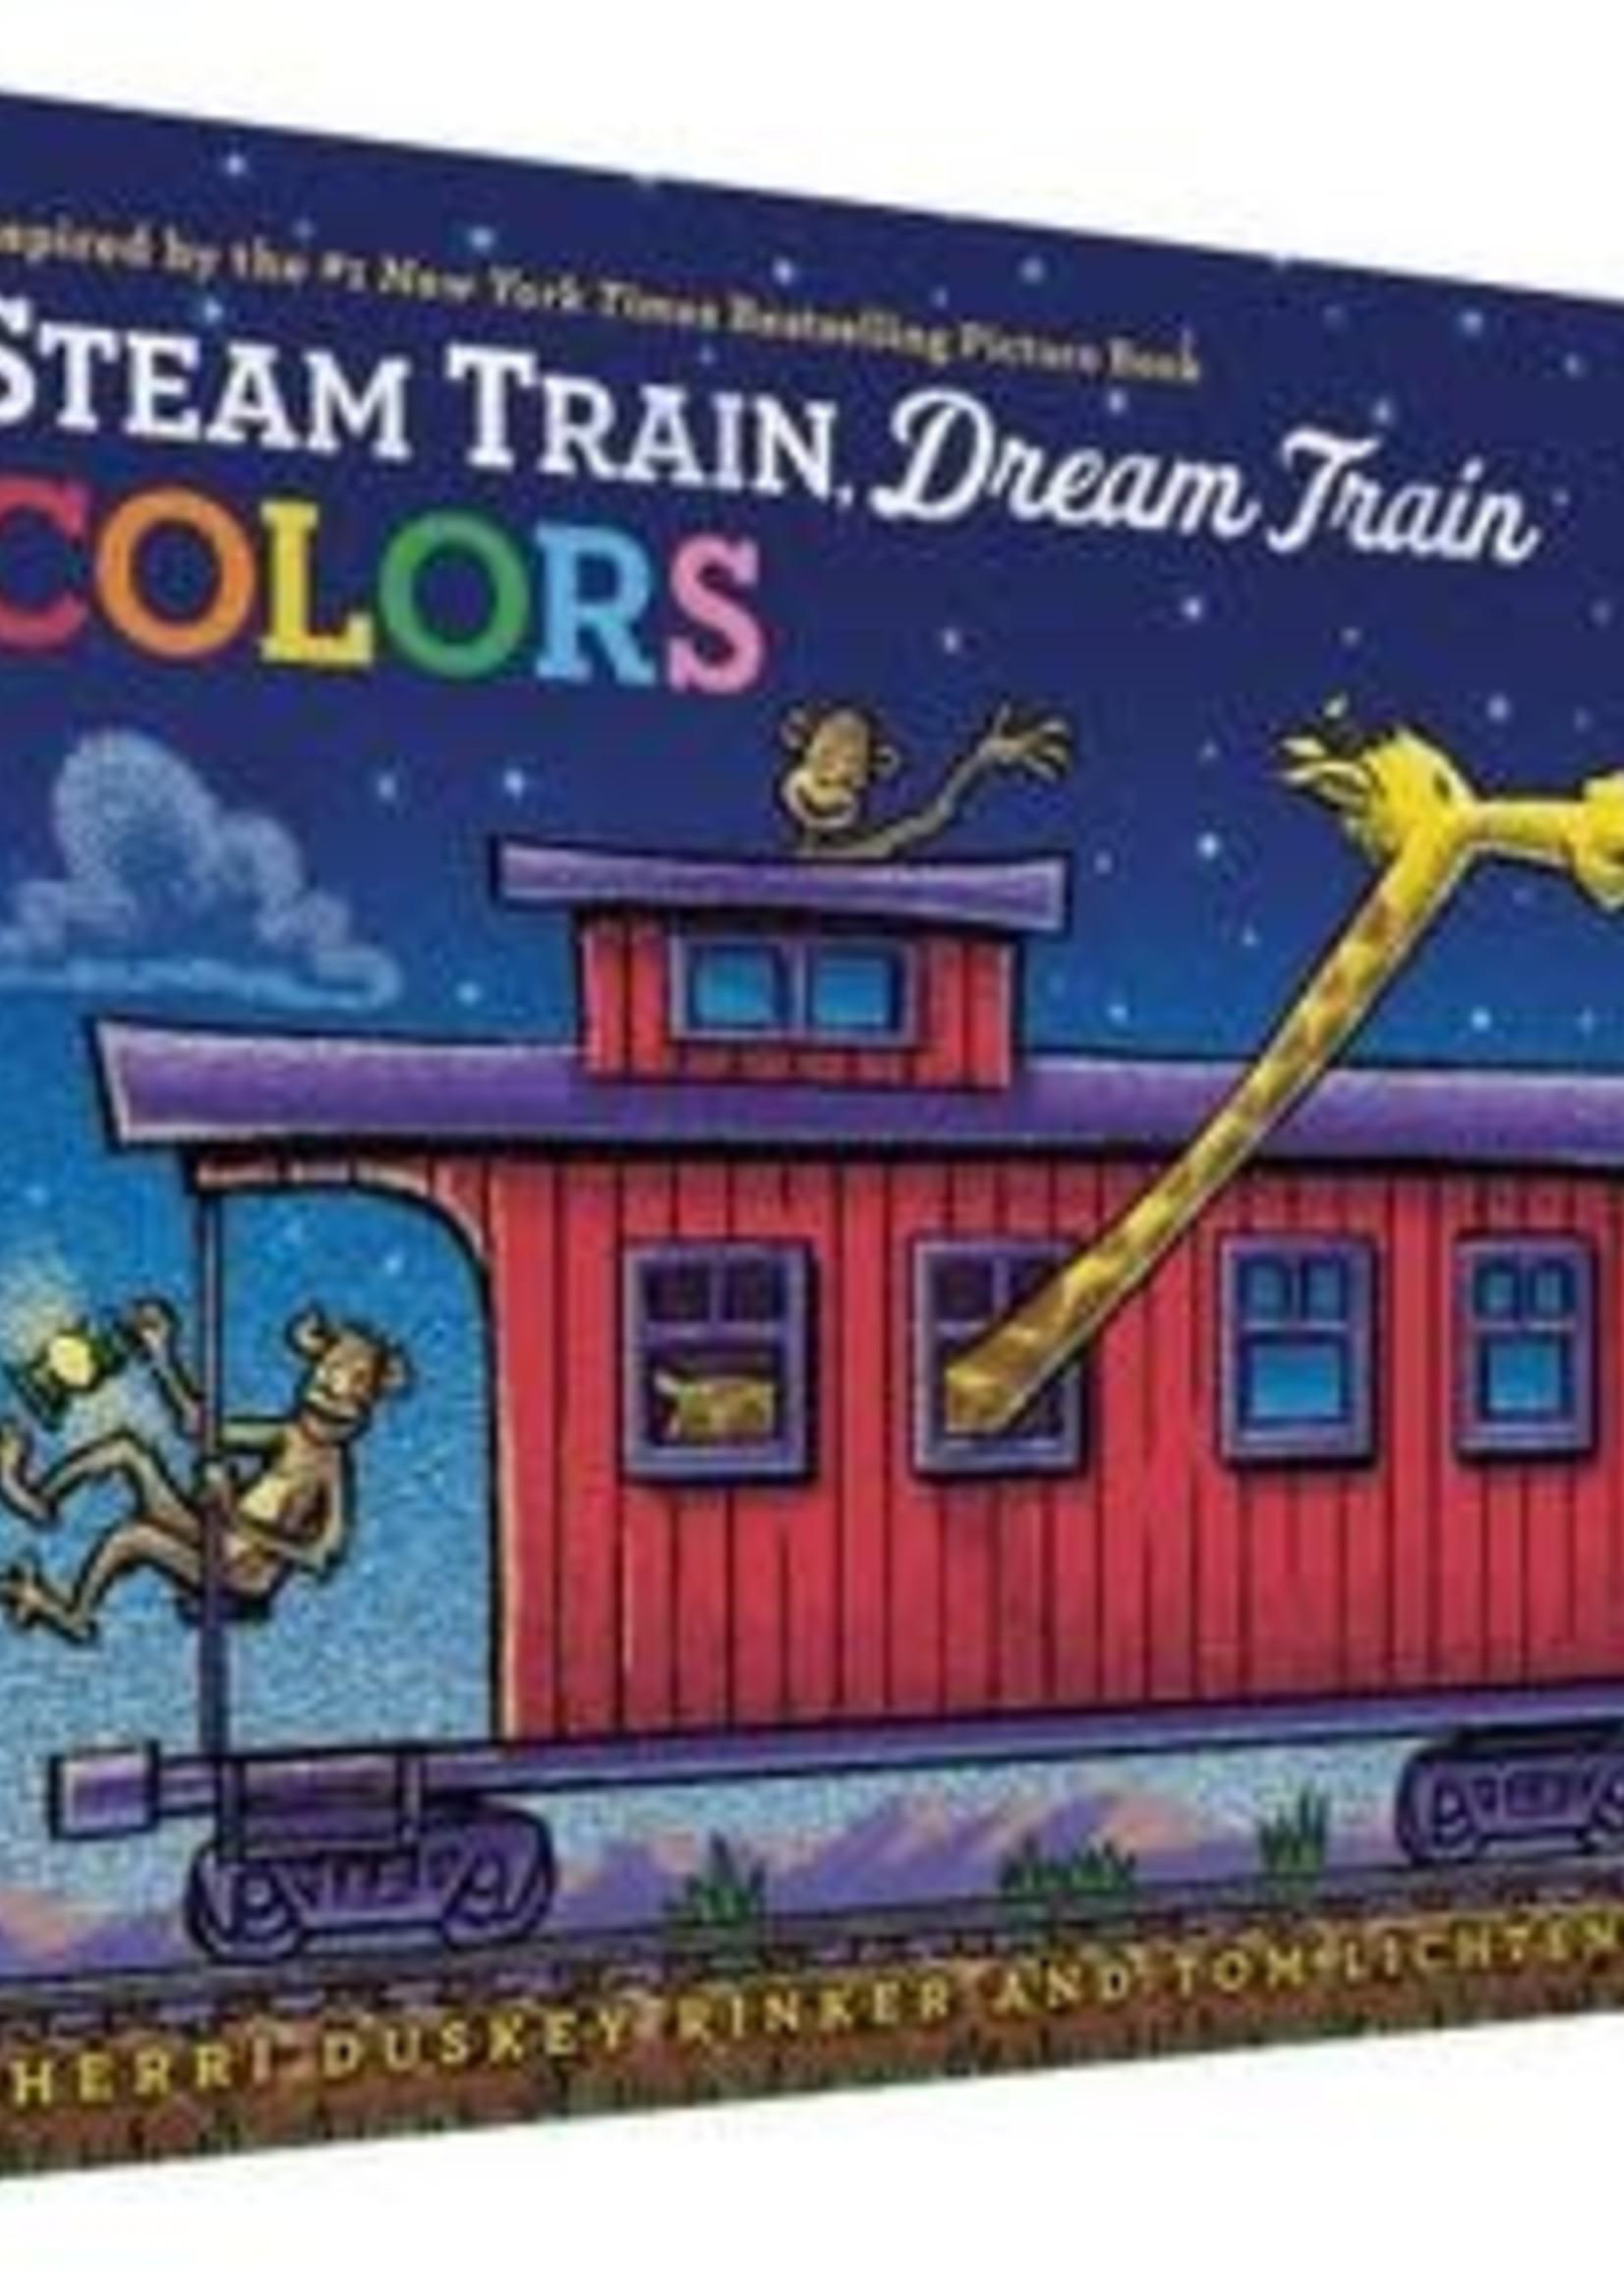 Steam Train, Dream Train Colors by Sherri Duskey Rinker,  Tom Lichtenheld